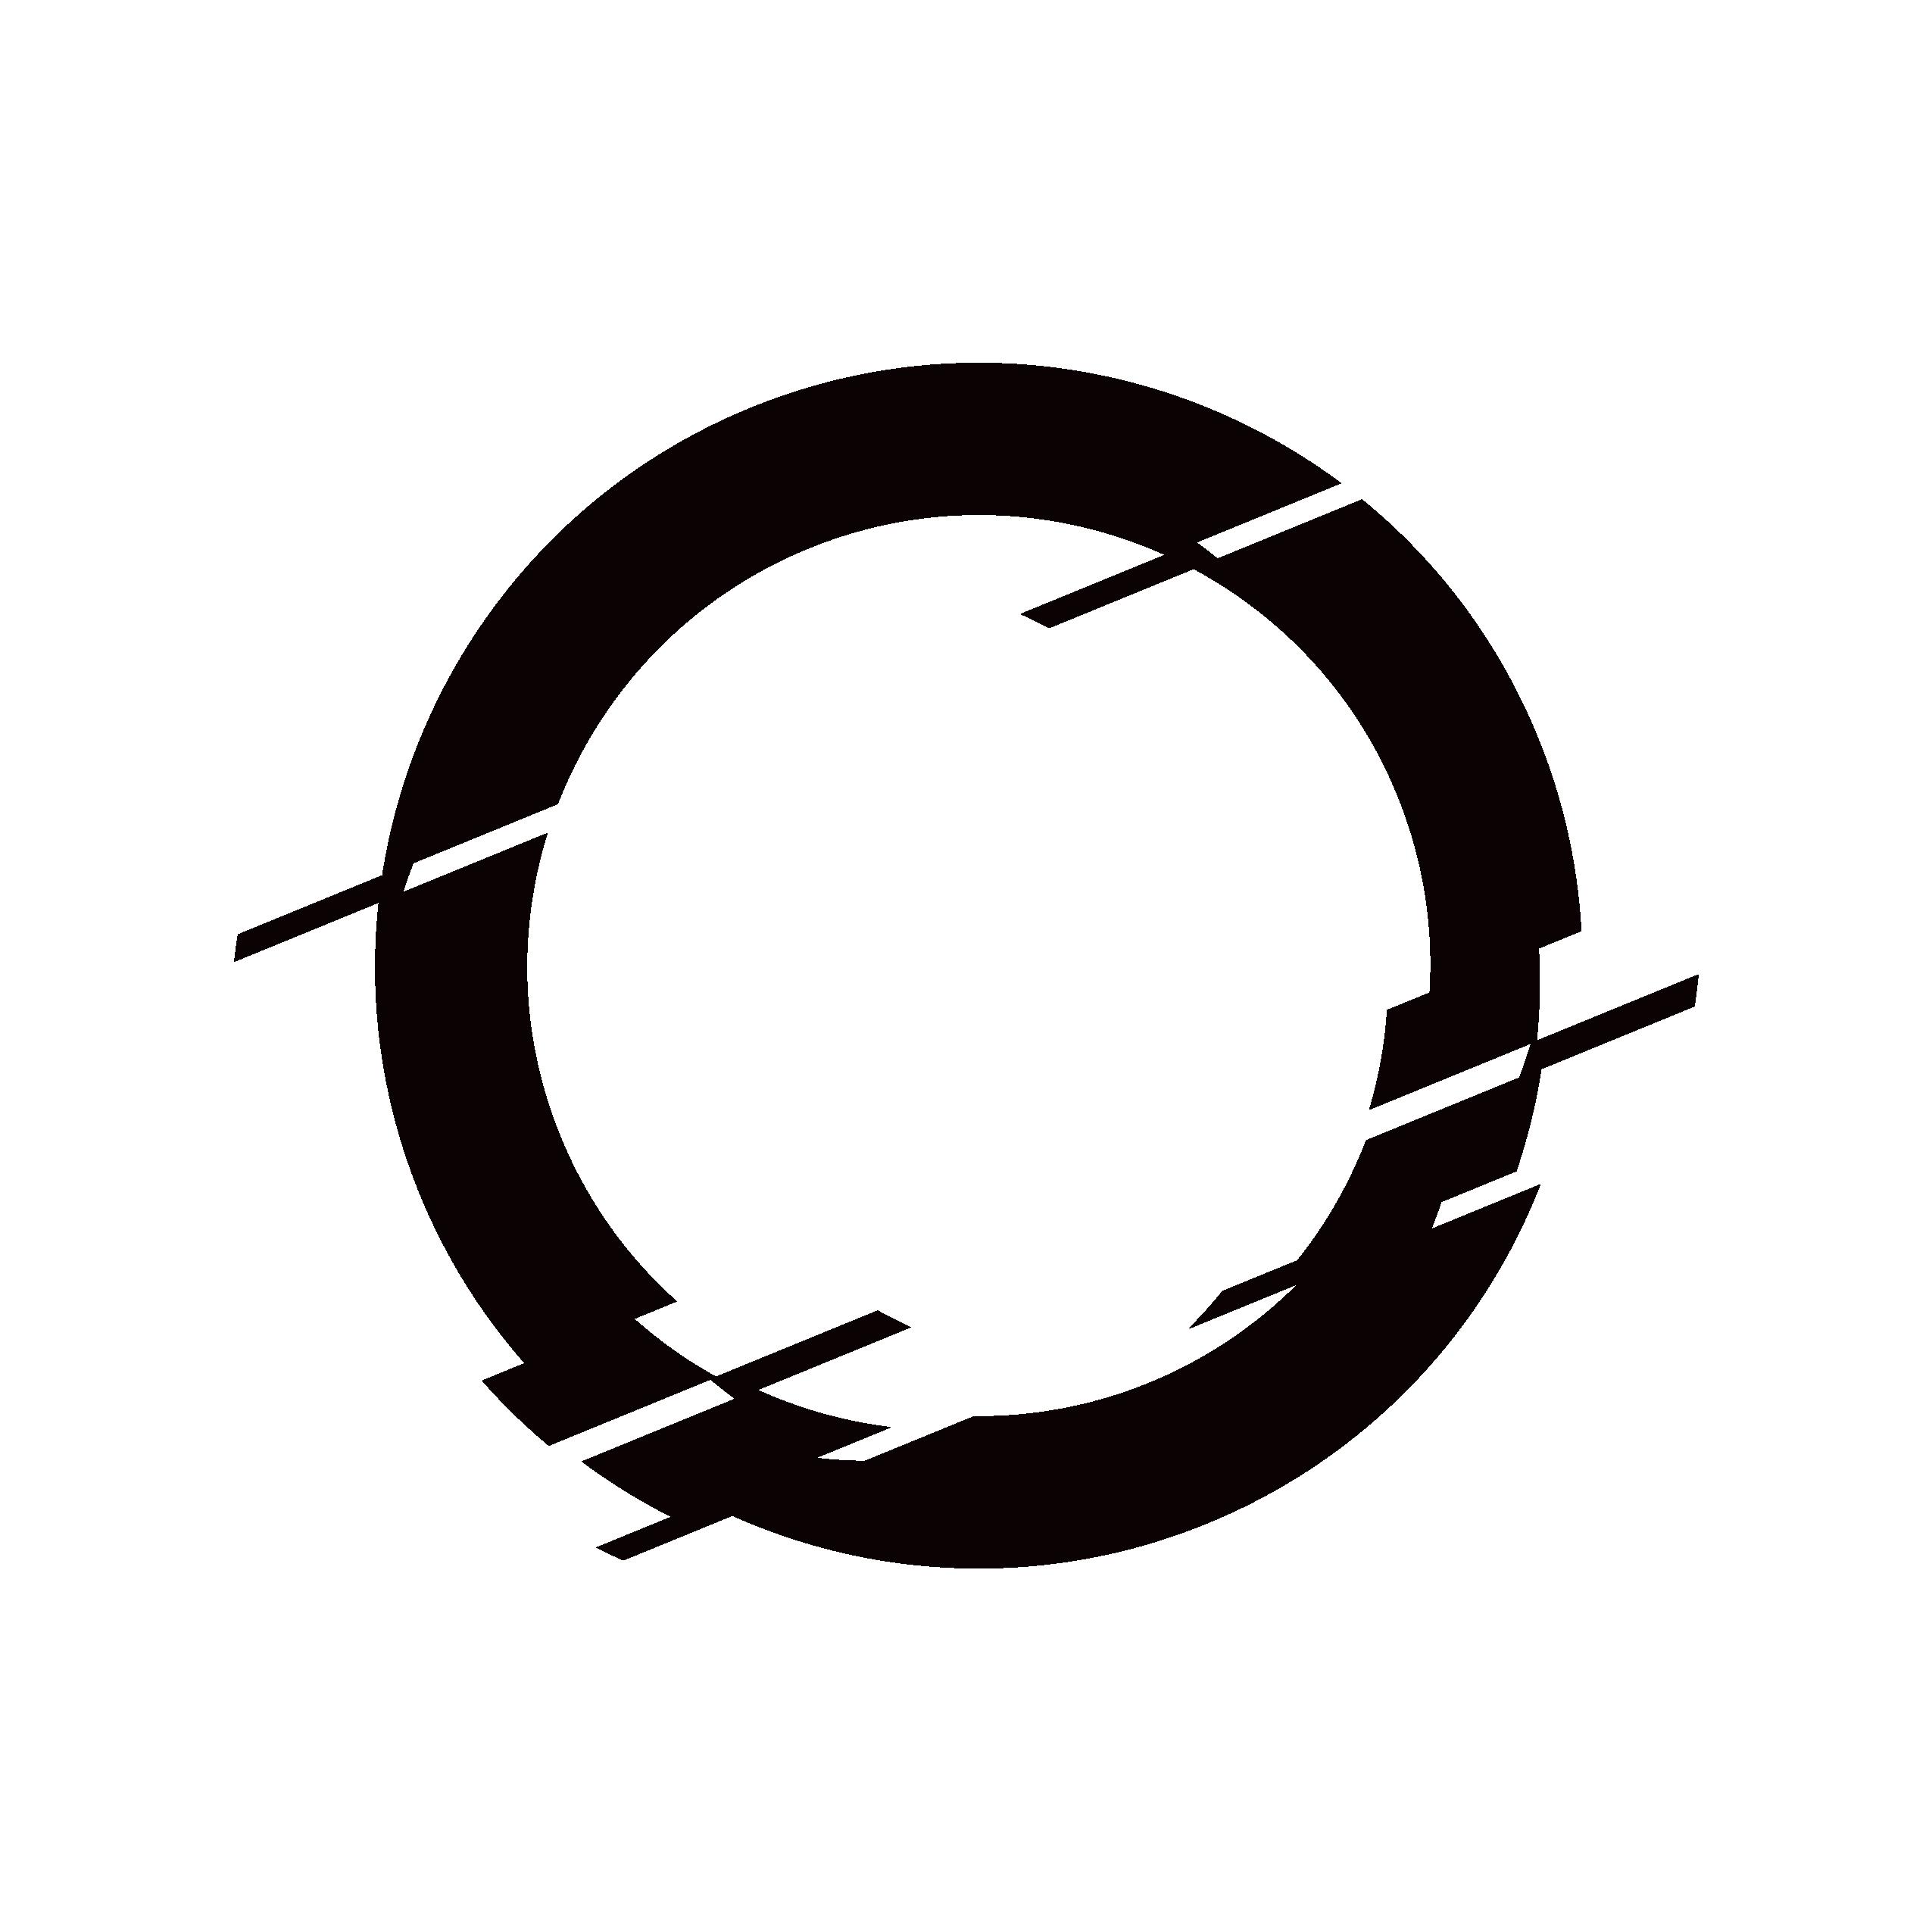 defense club logo a circle with glitches